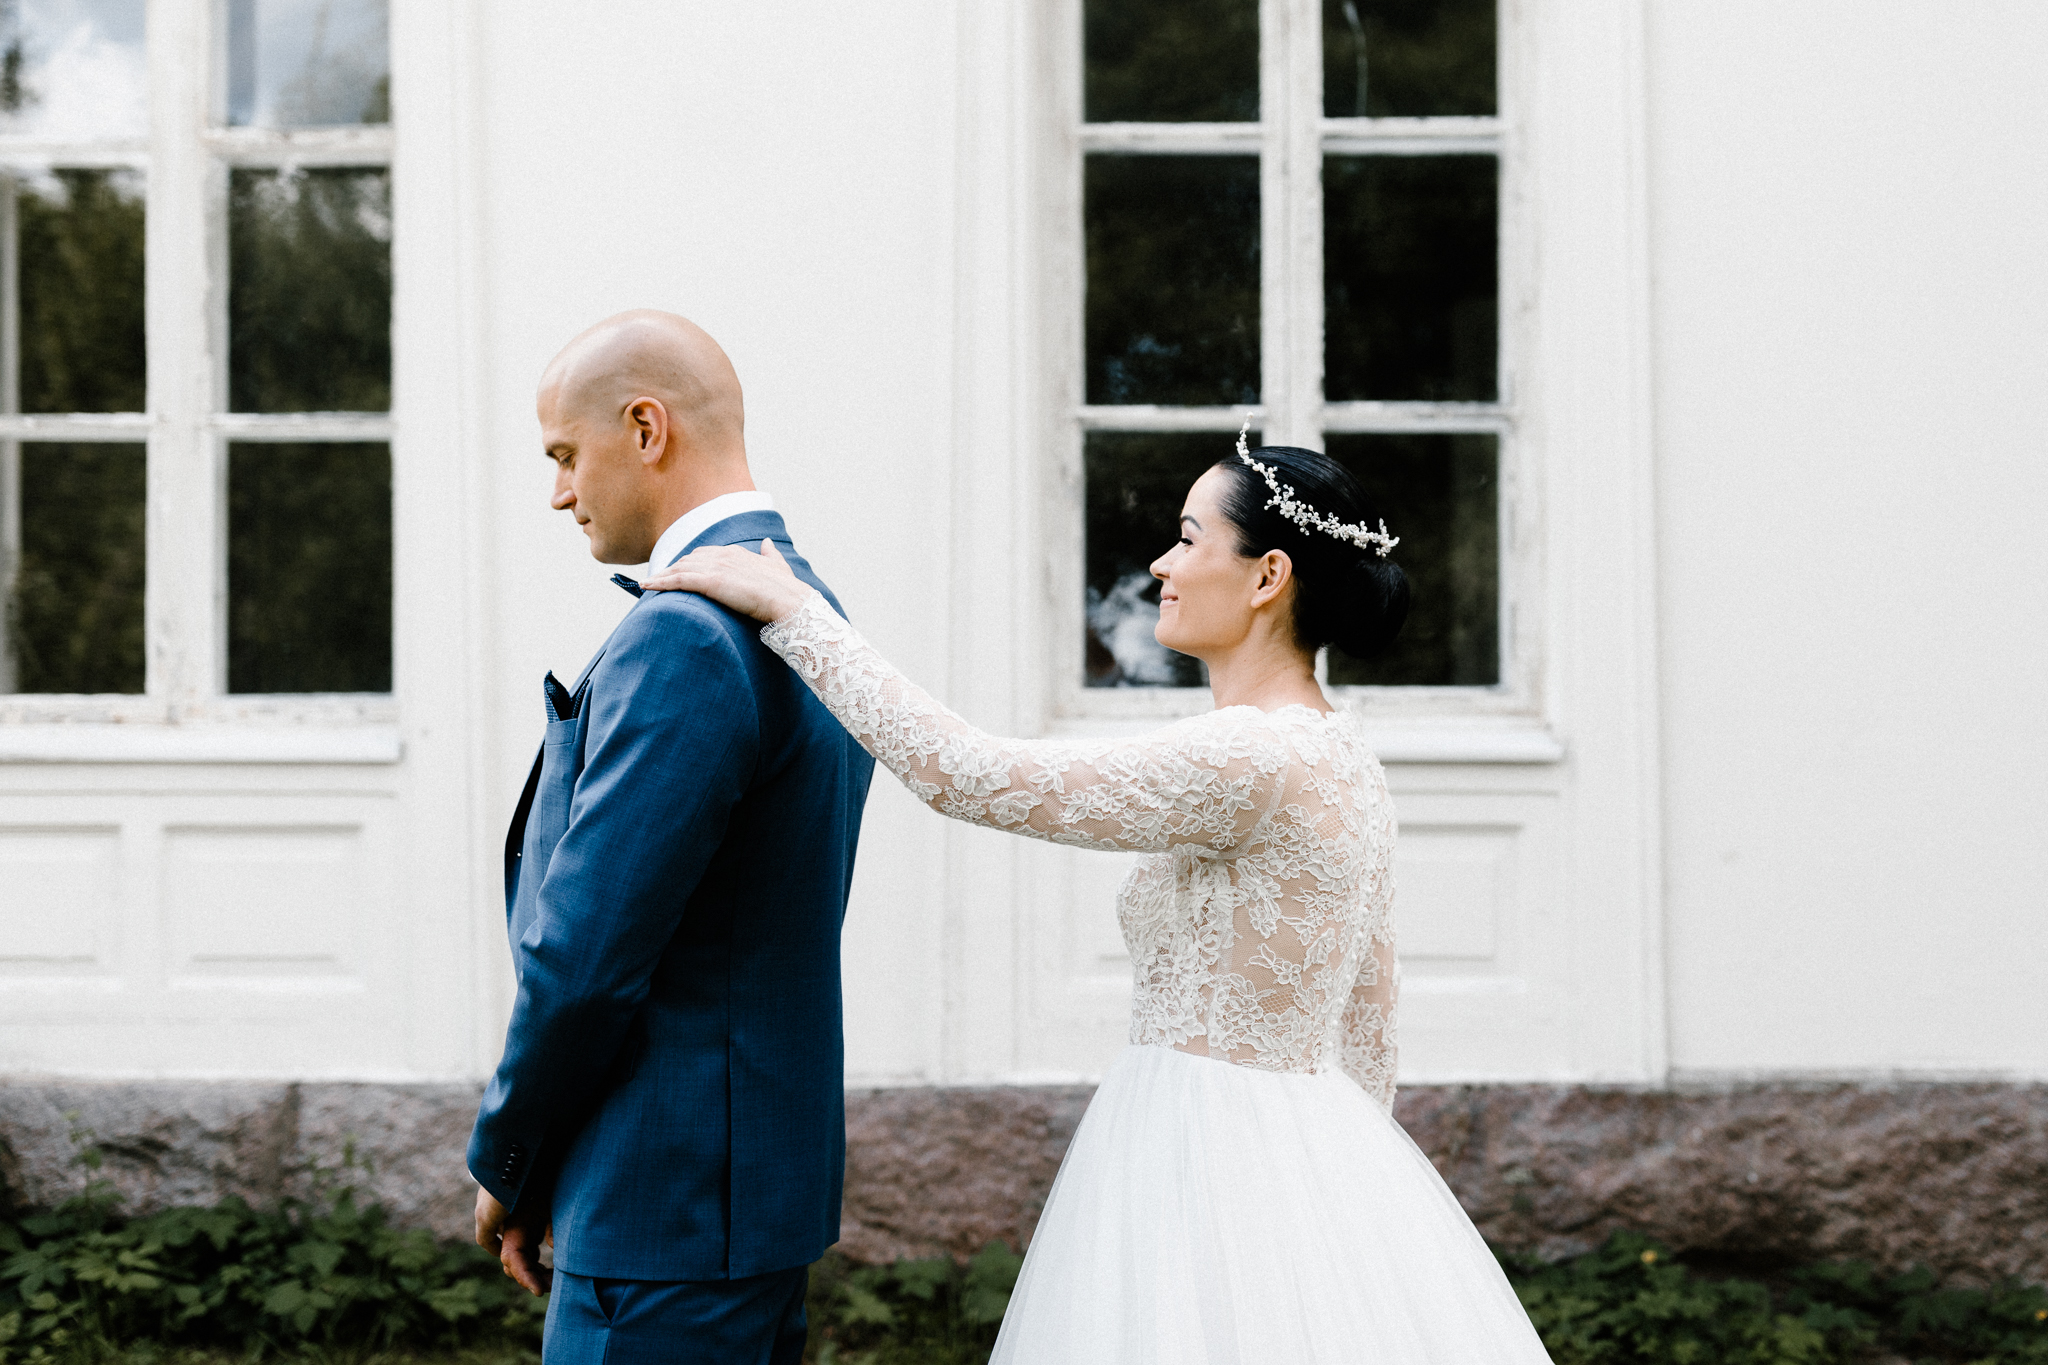 Essi + Ville   Oitbacka Gården   by Patrick Karkkolainen Wedding Photography-44.jpg